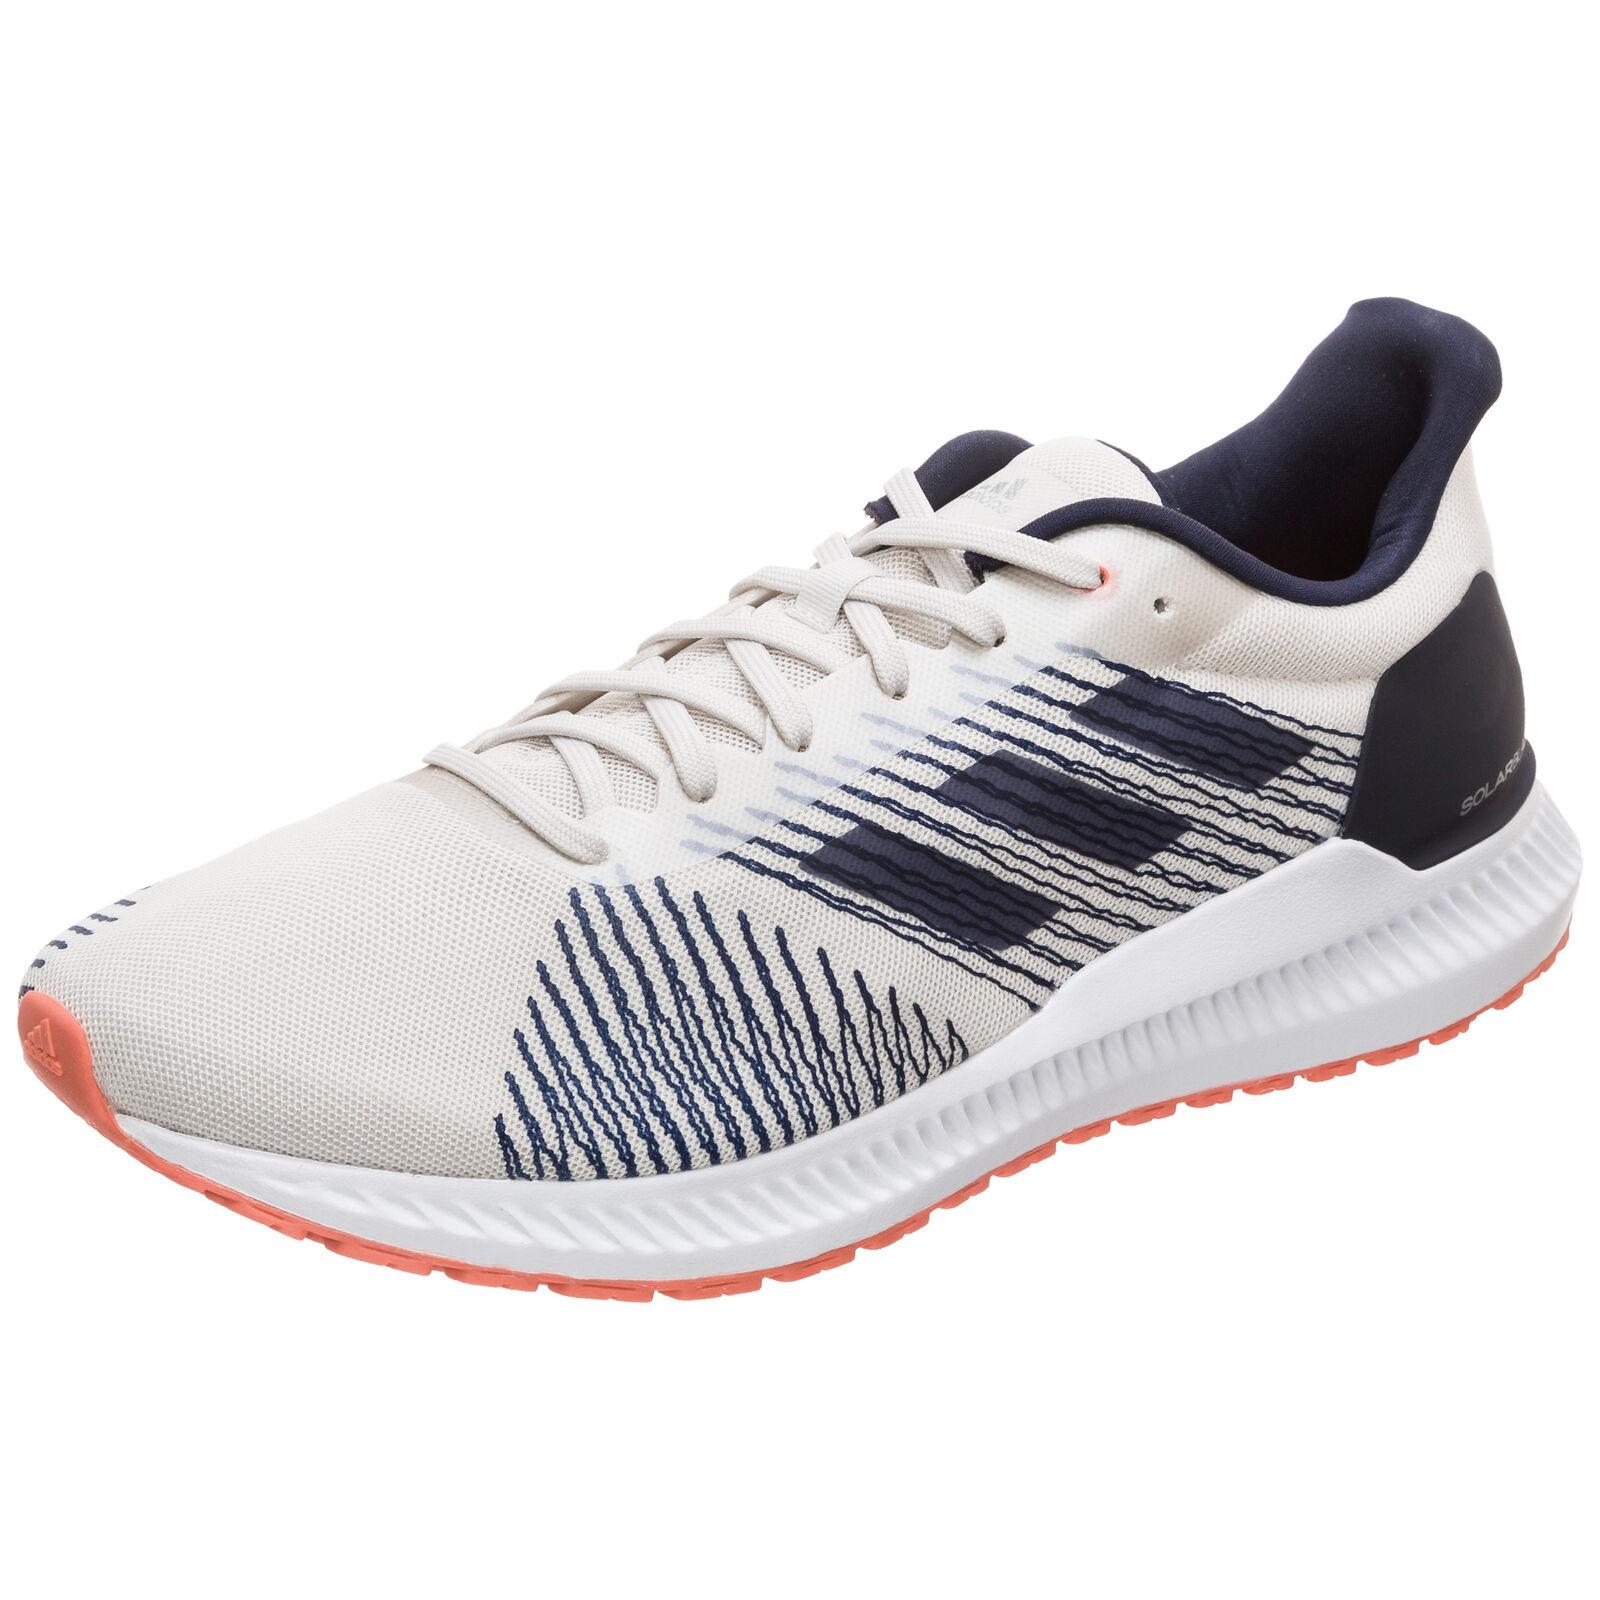 Adidas Performance Solar Blaze Laufschuh Herren NEU Schuhe Schuhe Schuhe Turnschuhe e81ccd